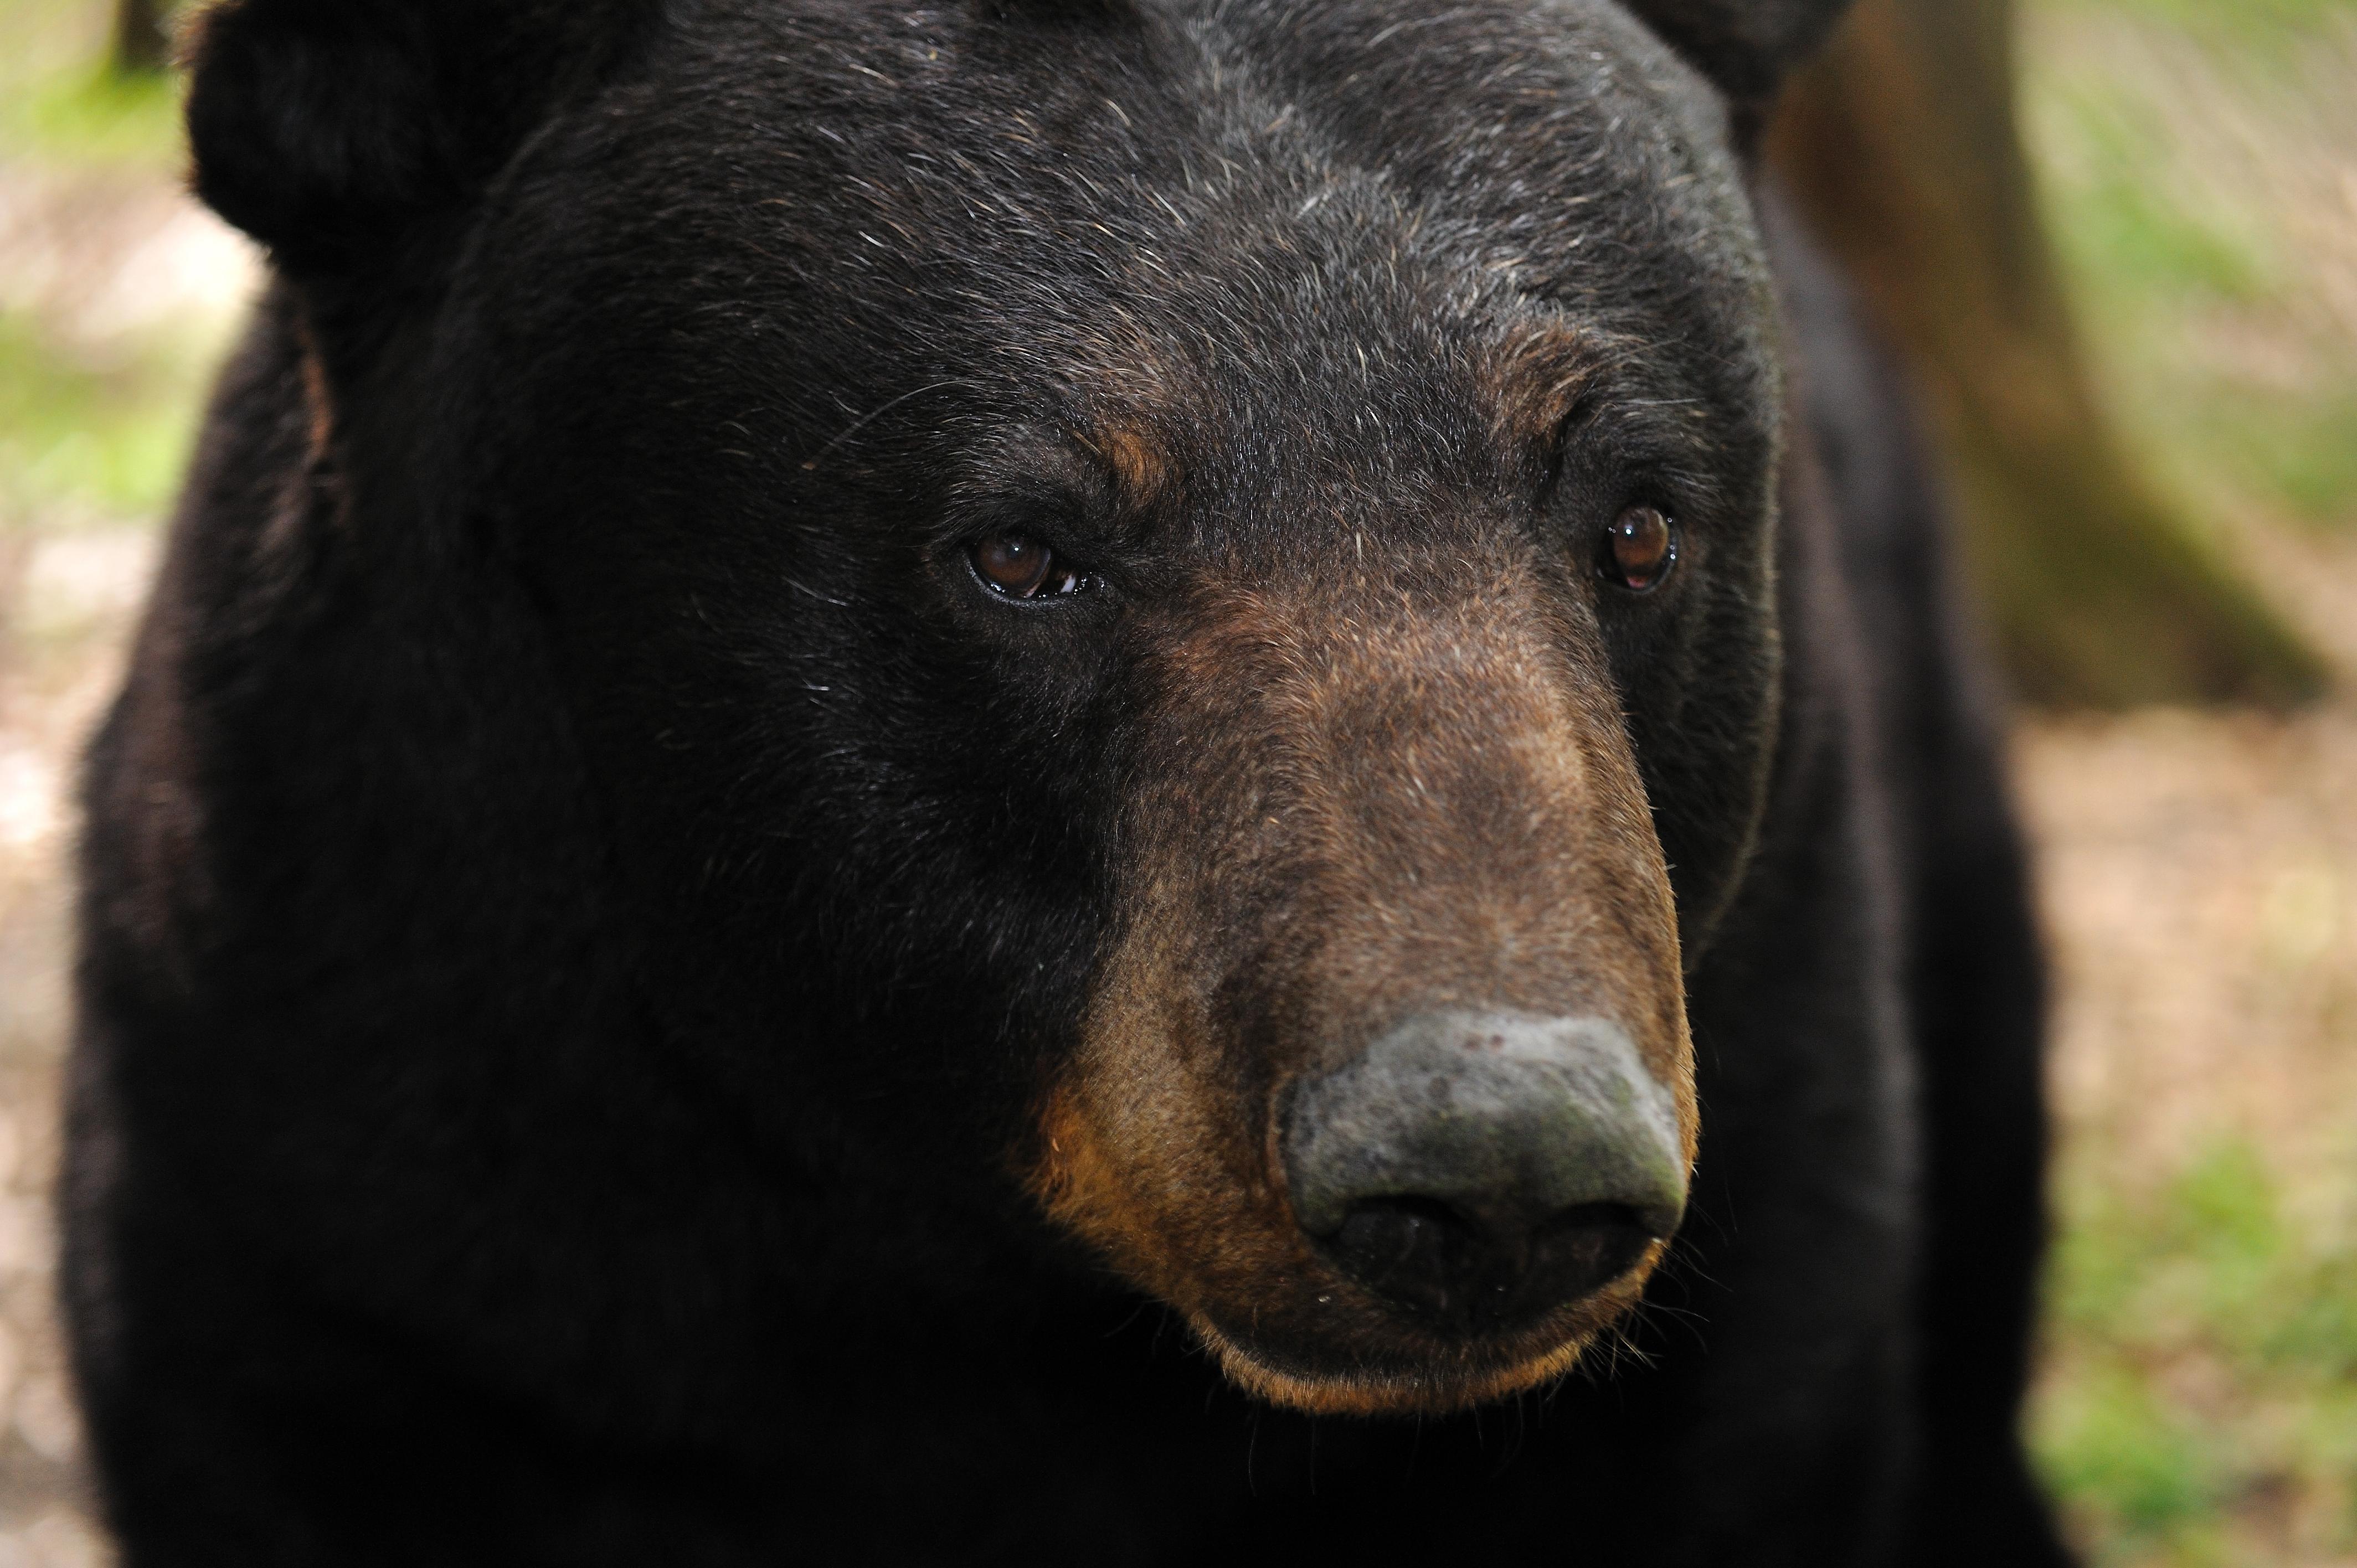 Black bear (Ursus americanus) captive, Fla.